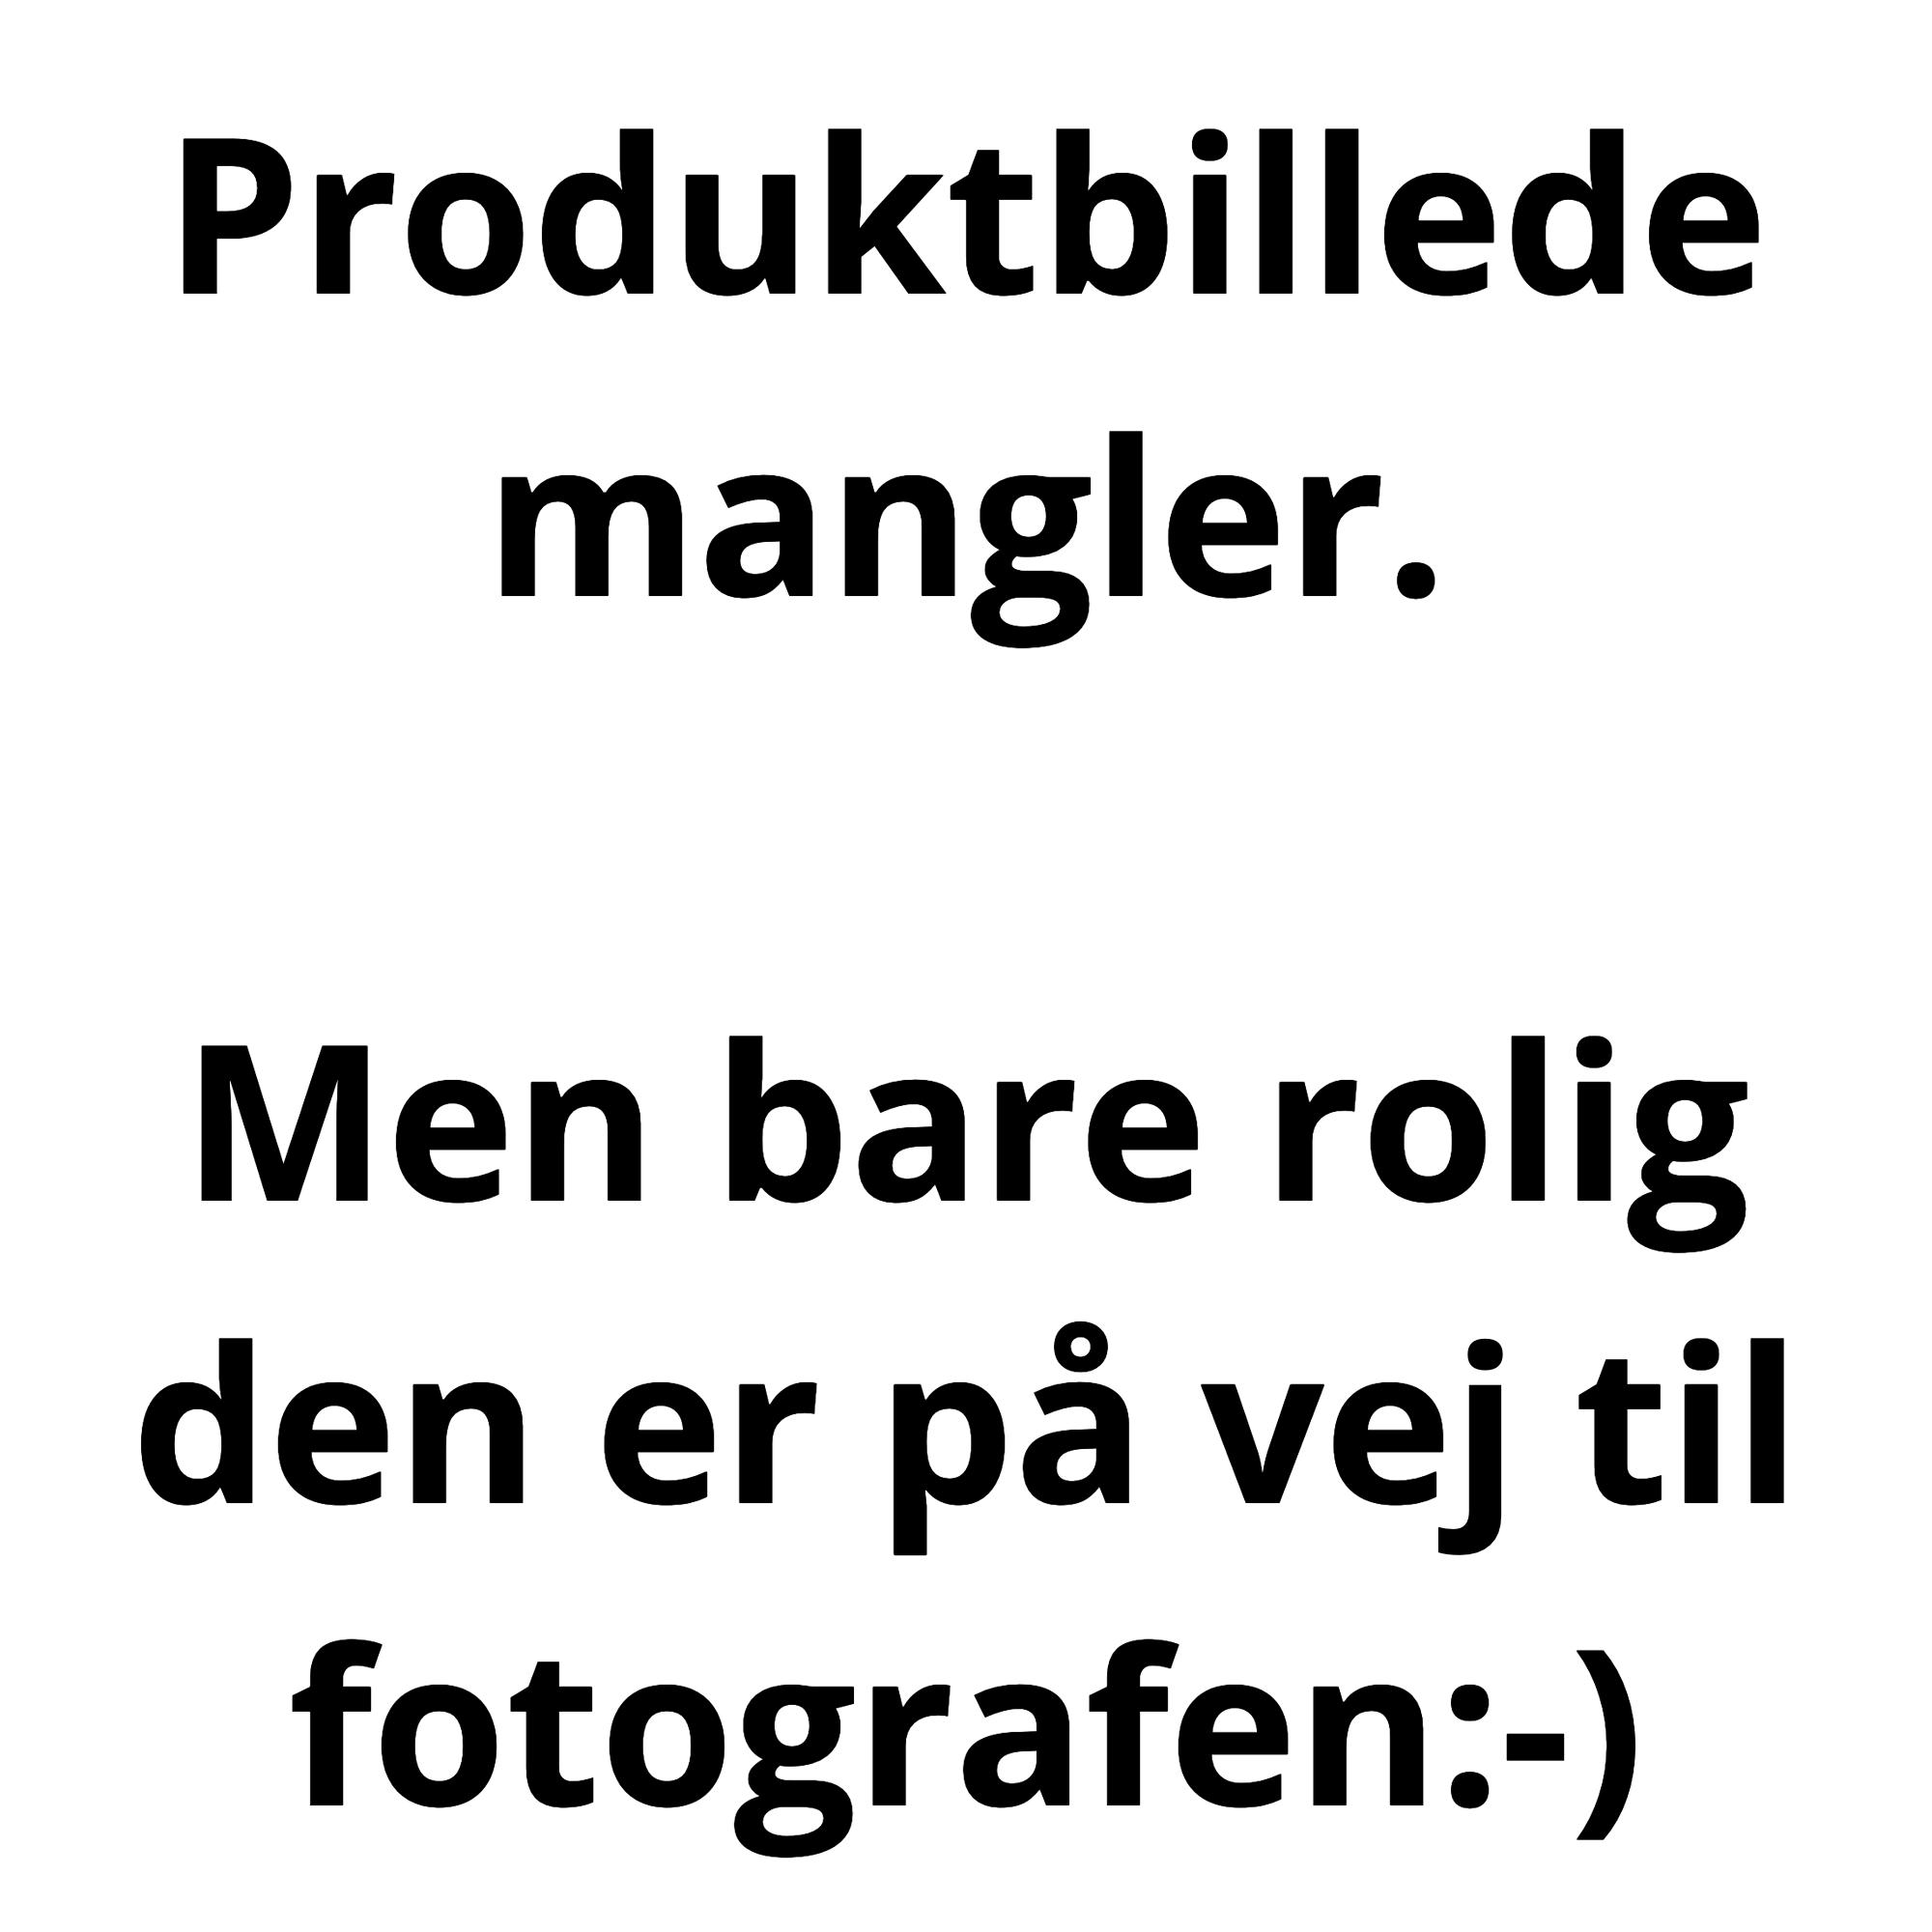 Incipio Octane Beskyttelsescover til Samung Galaxy S6 Edge Plus - Frost/Sort